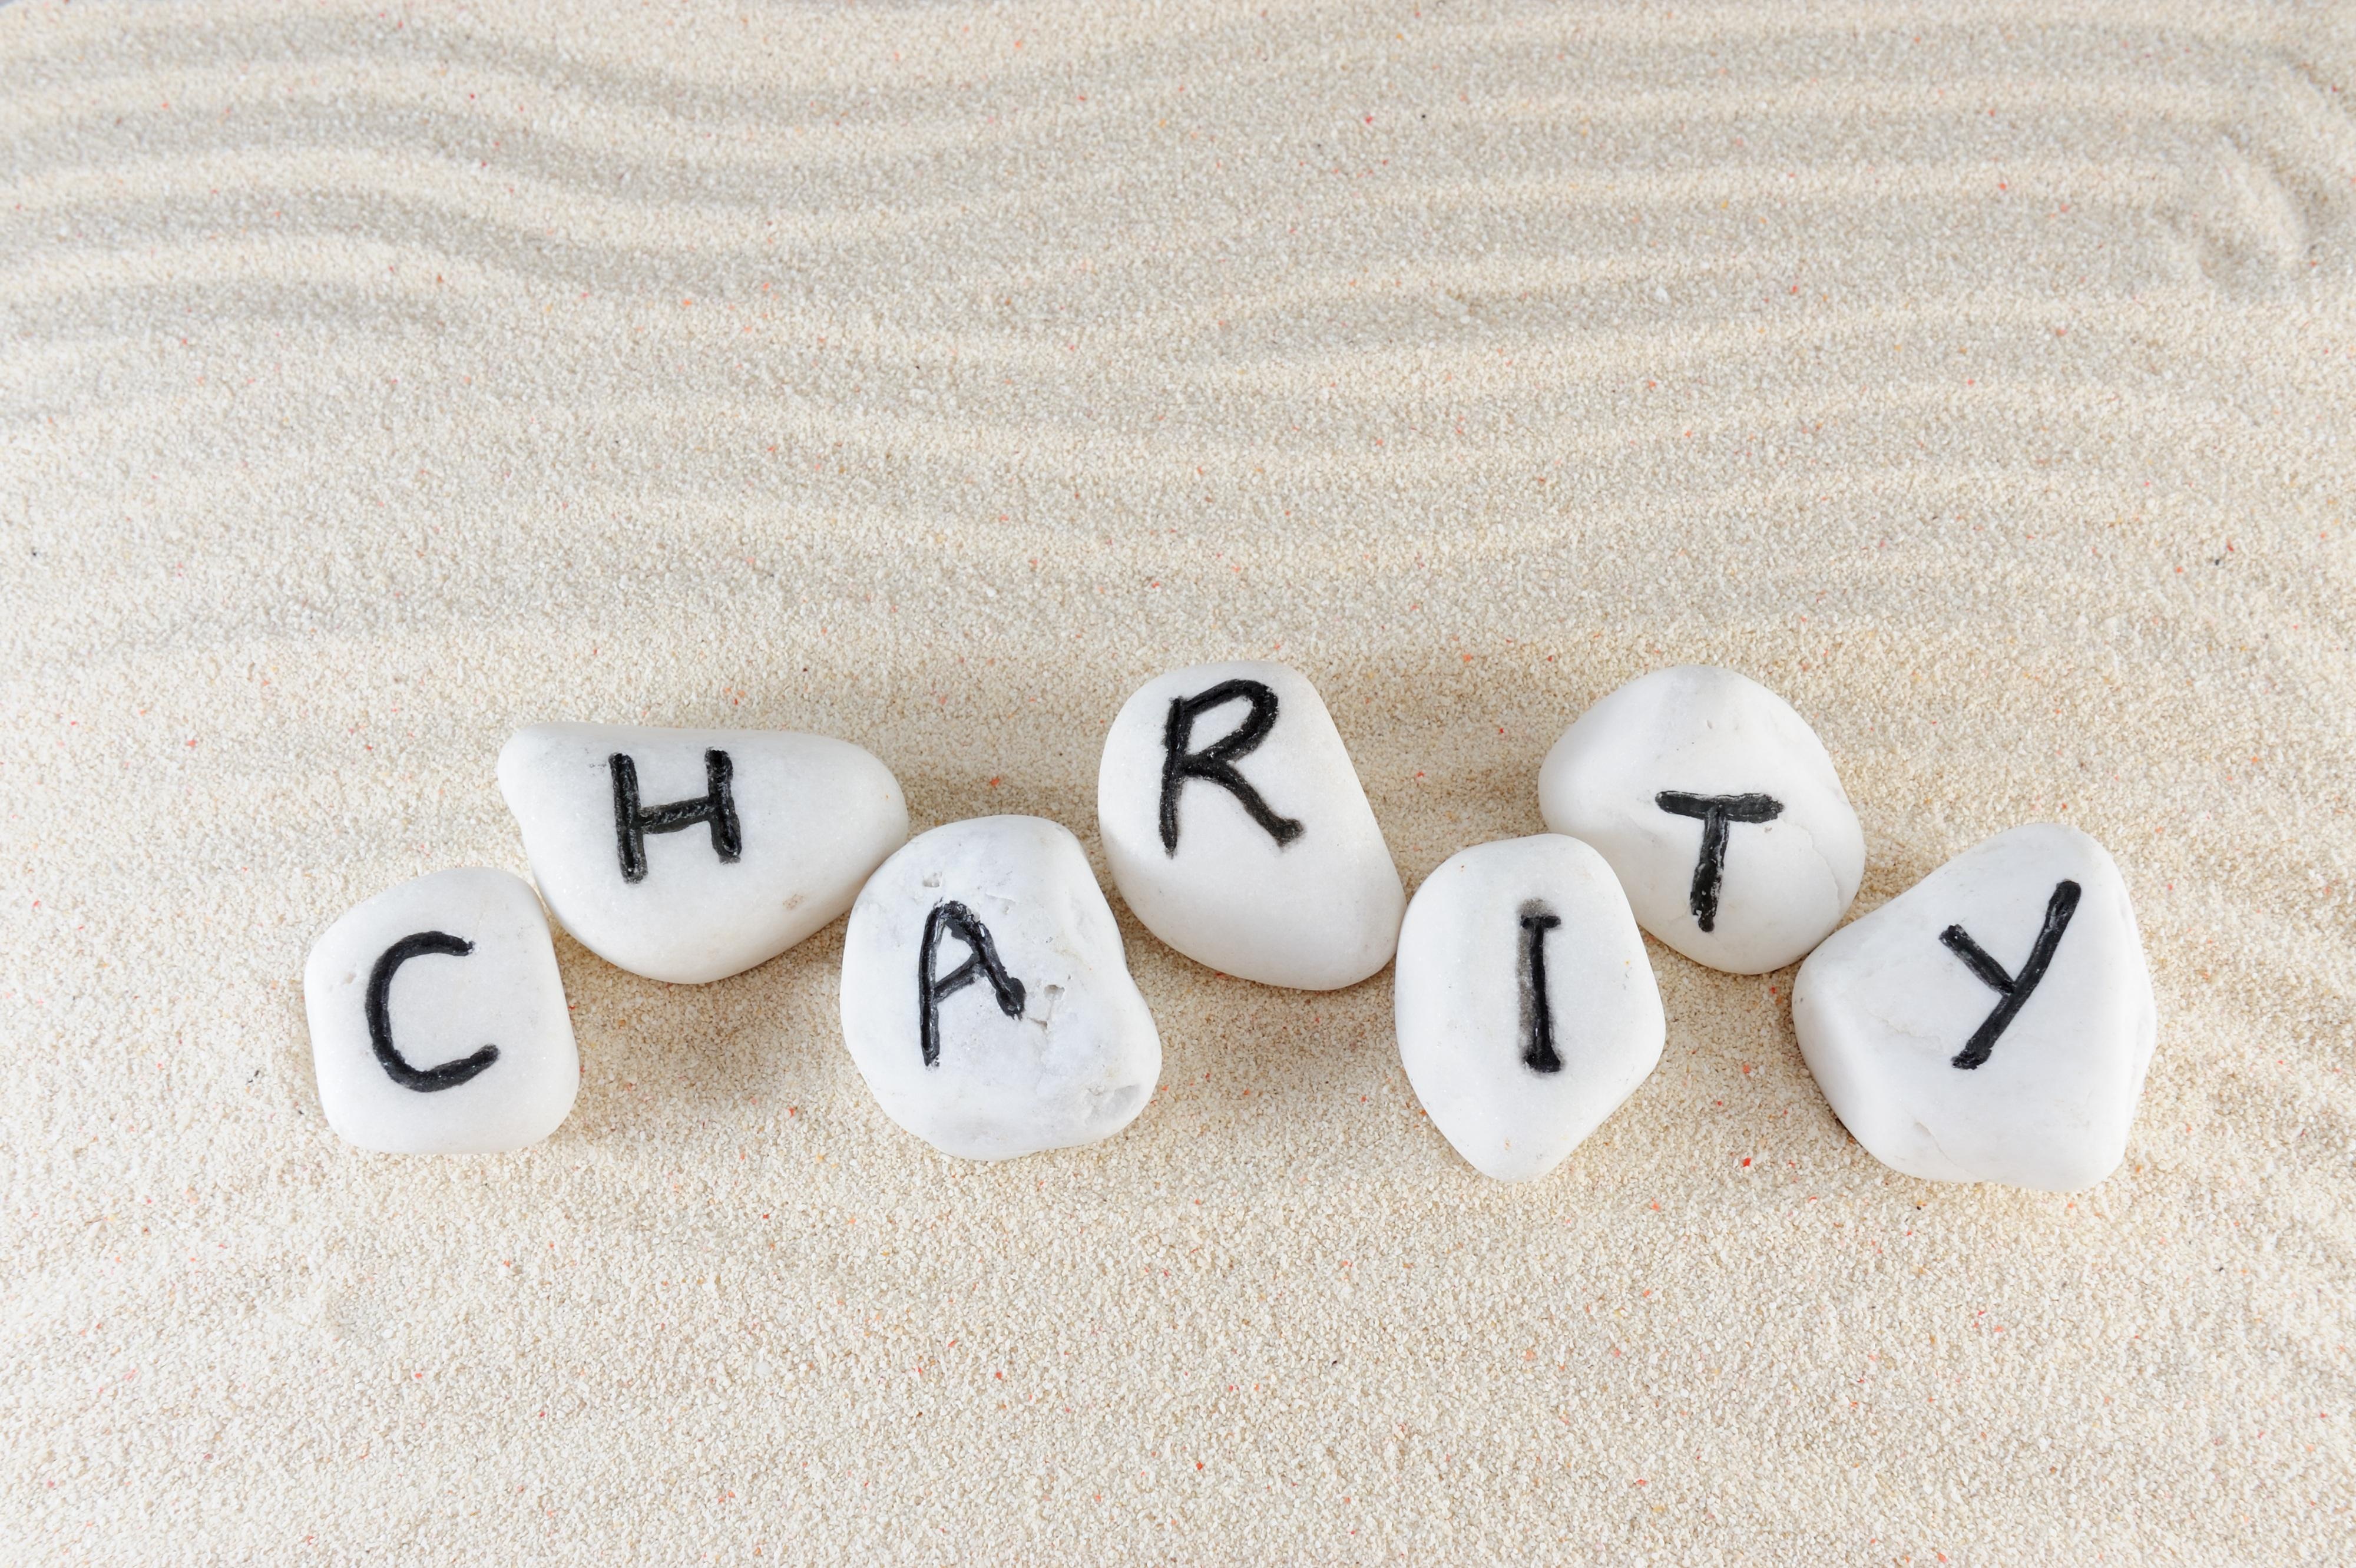 between-charity-and-zakah